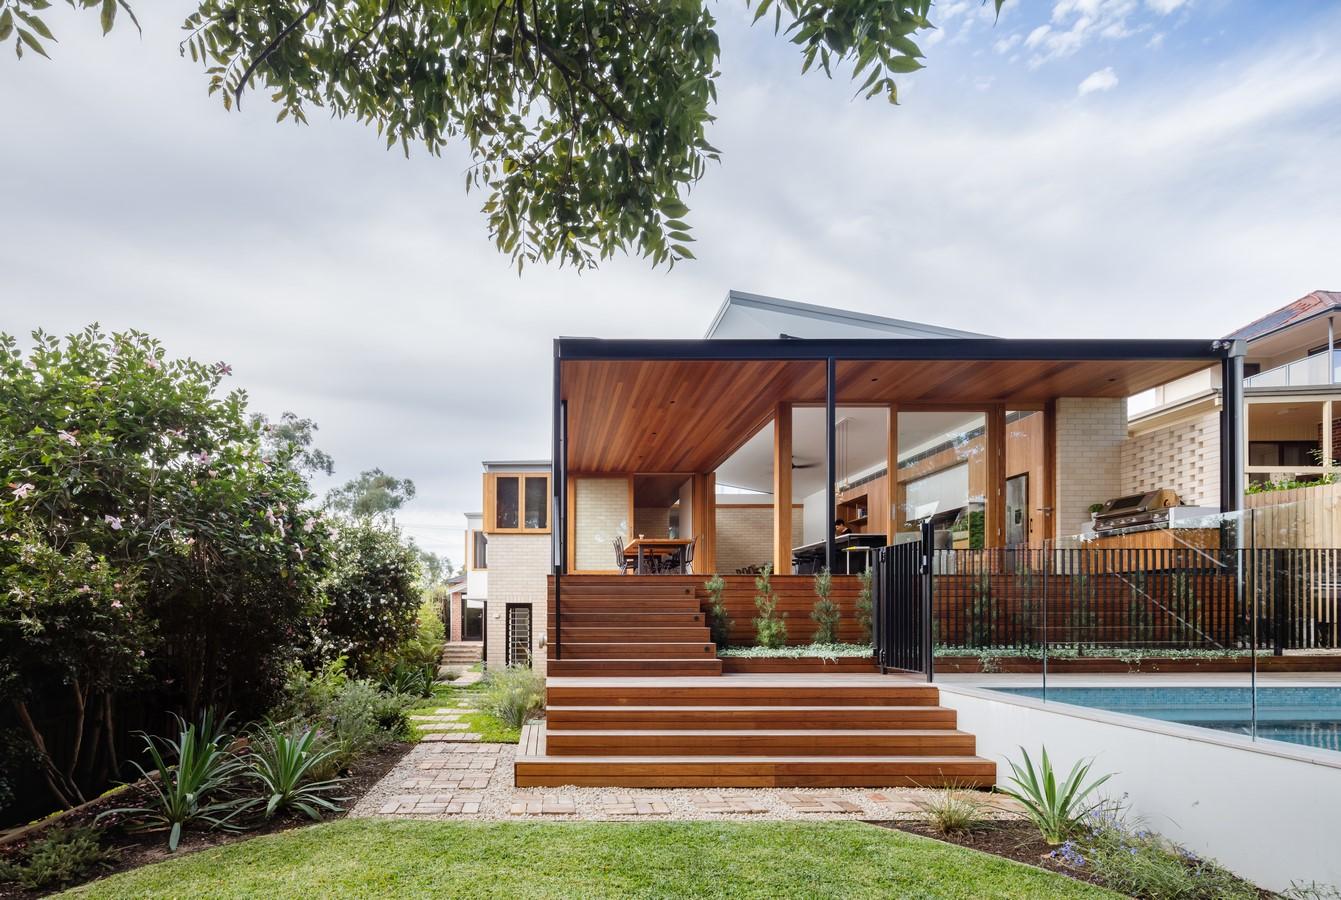 5071 Longueville House by Vanessa Wegner Architect : Sheet 3